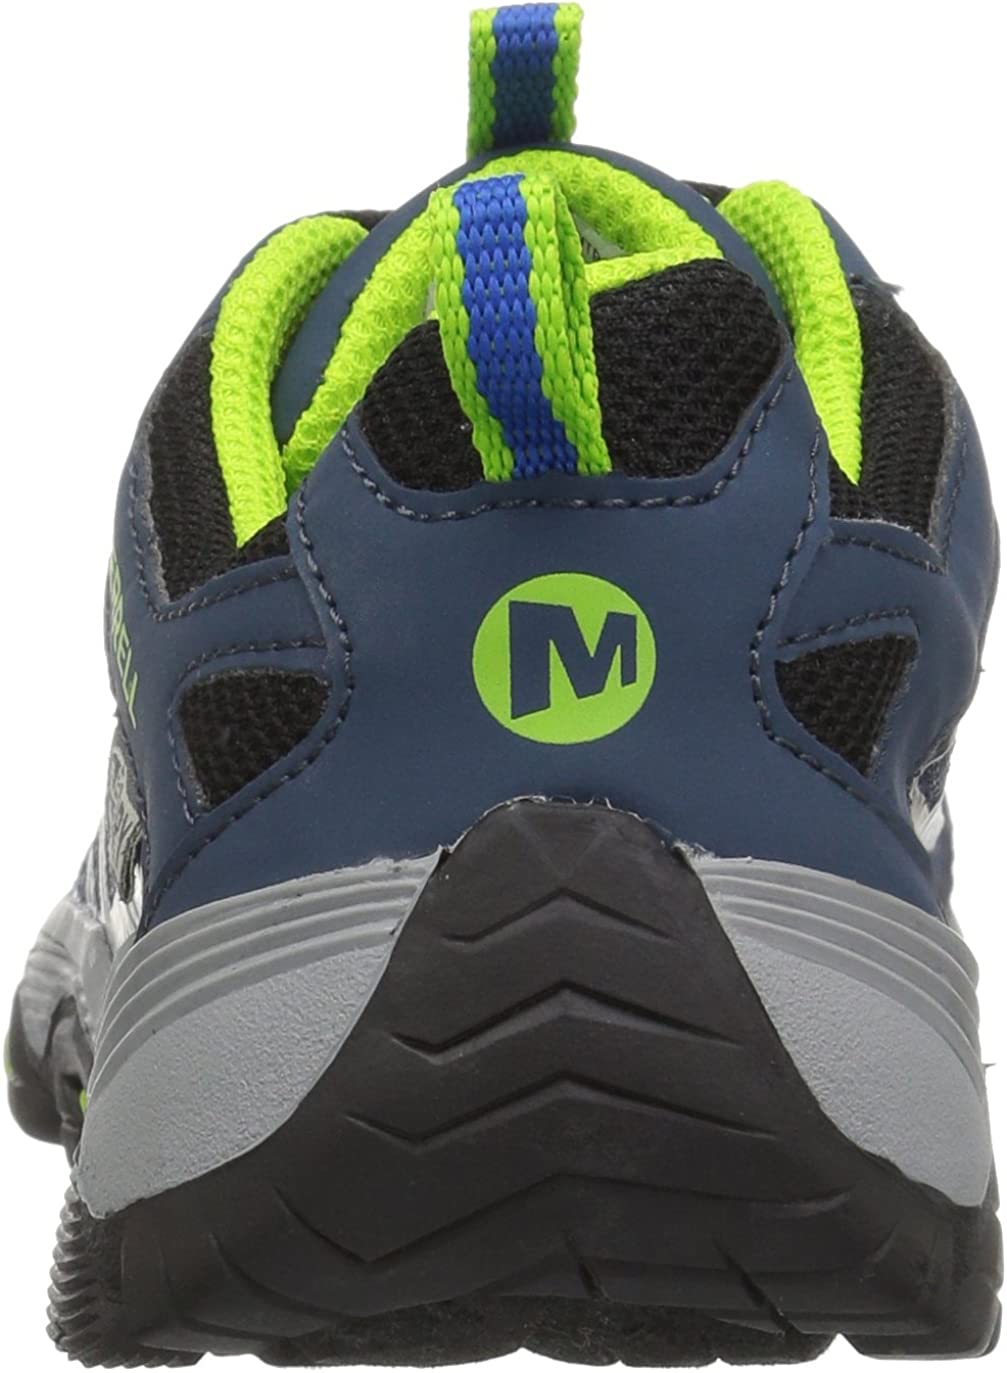 Zapatillas de Senderismo para Ni/ños Merrell Ml-Boys Moab Fst Low WTRPF